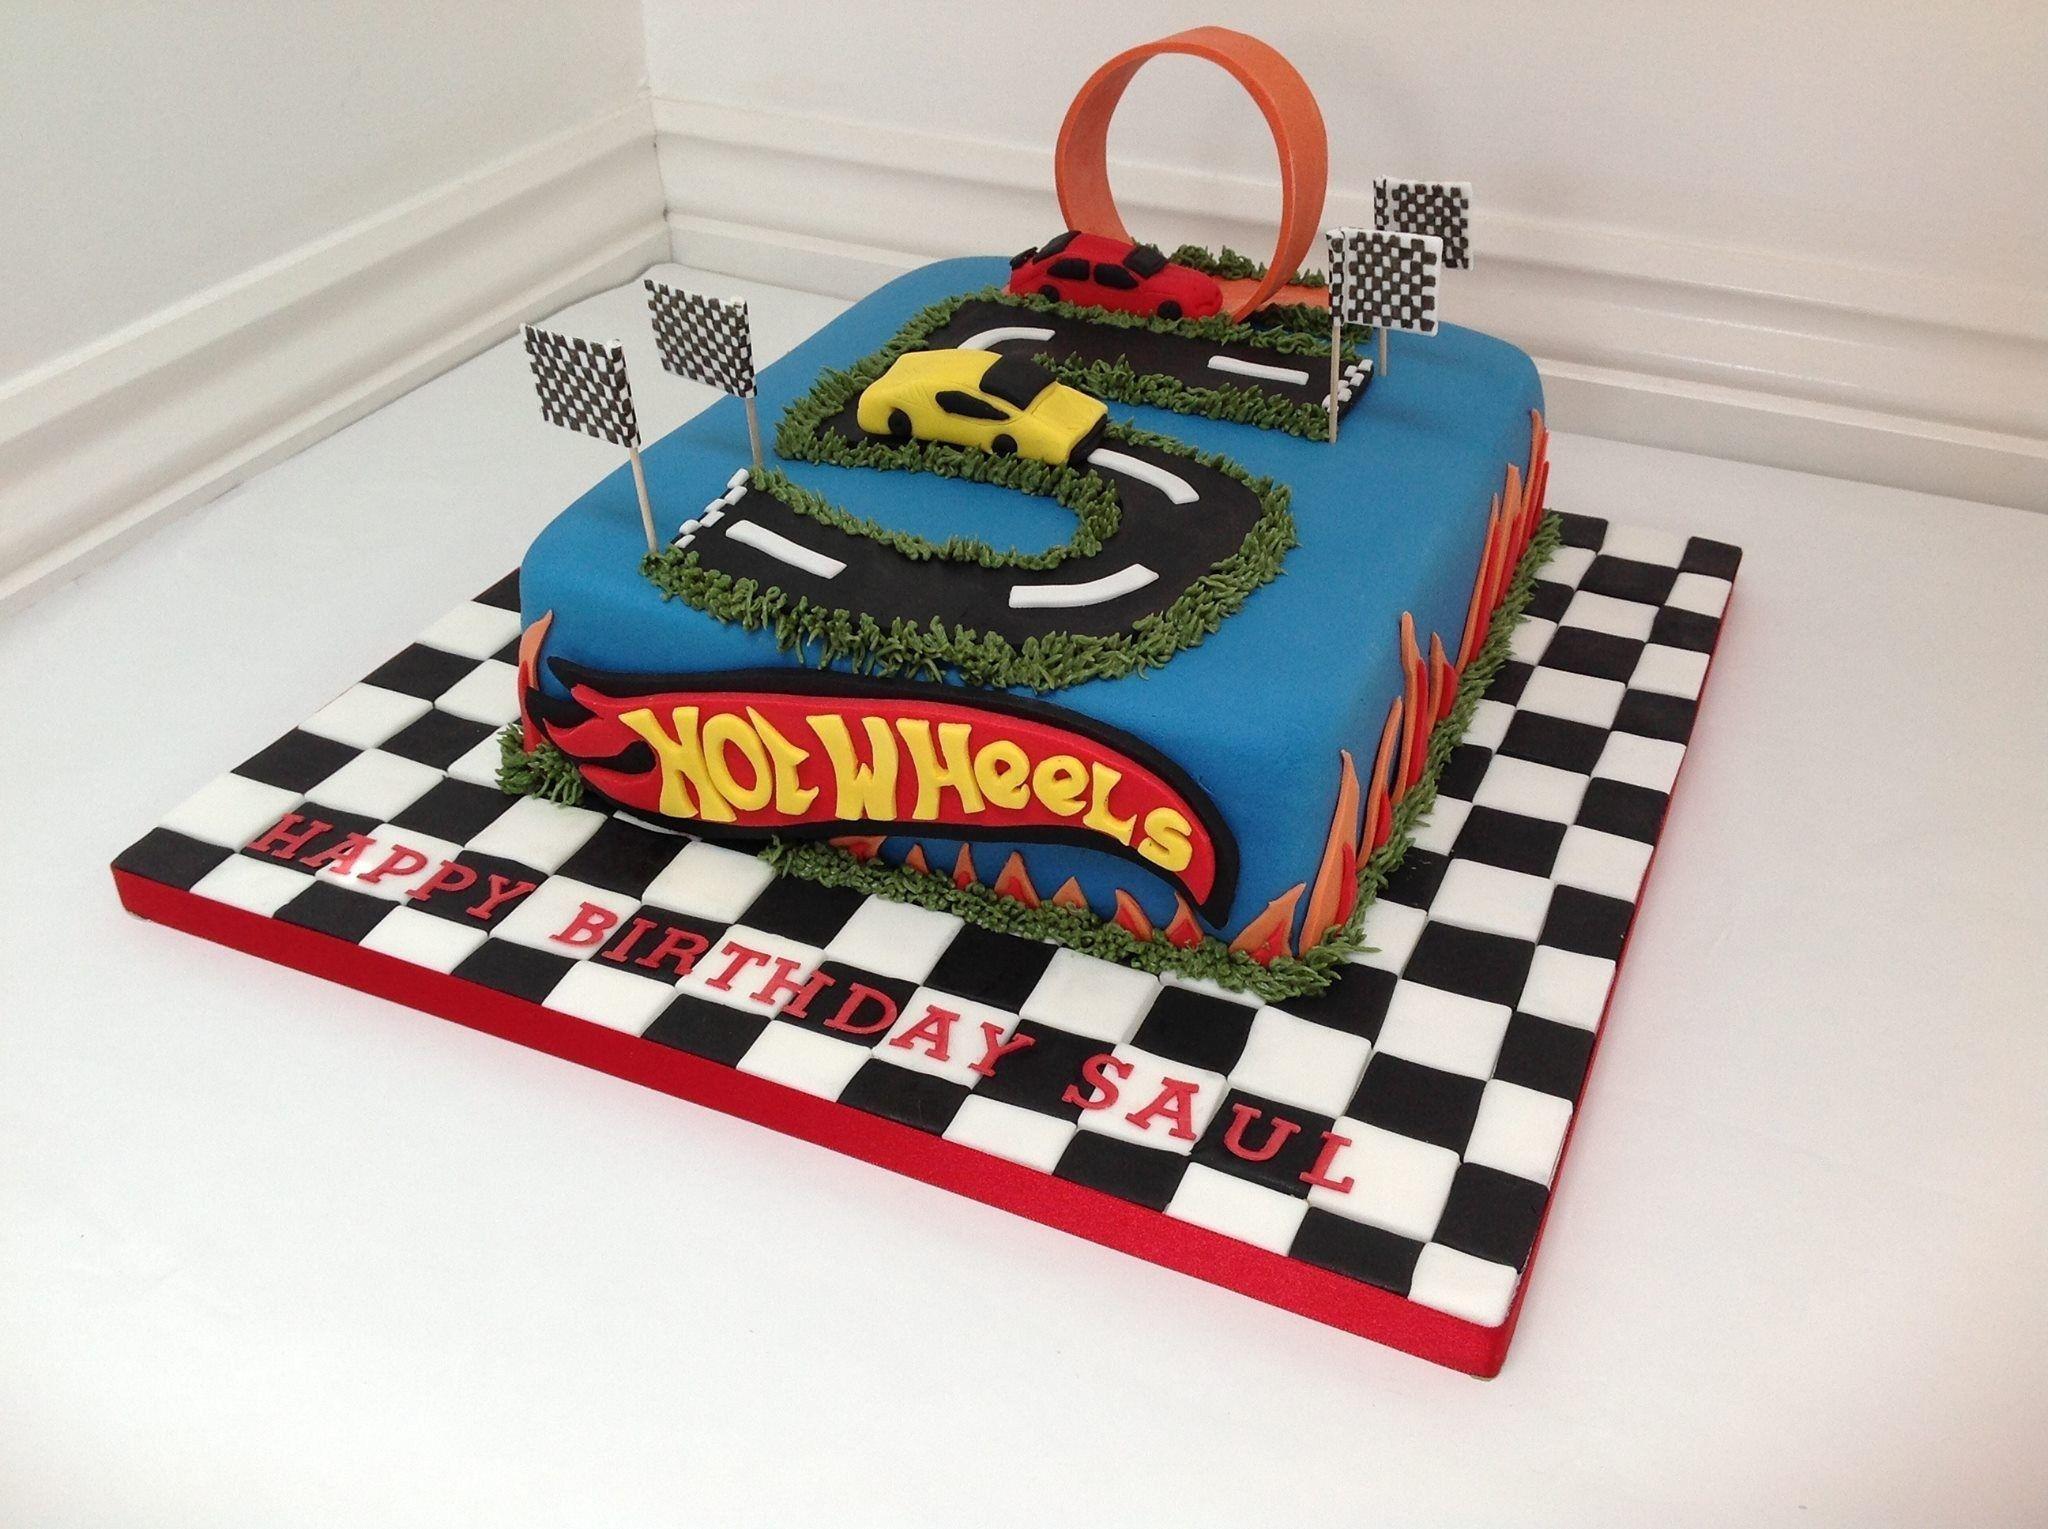 Strange Hot Wheels Birthday Cake A Hotwheels Cars Birthday Cake Fancy Funny Birthday Cards Online Alyptdamsfinfo